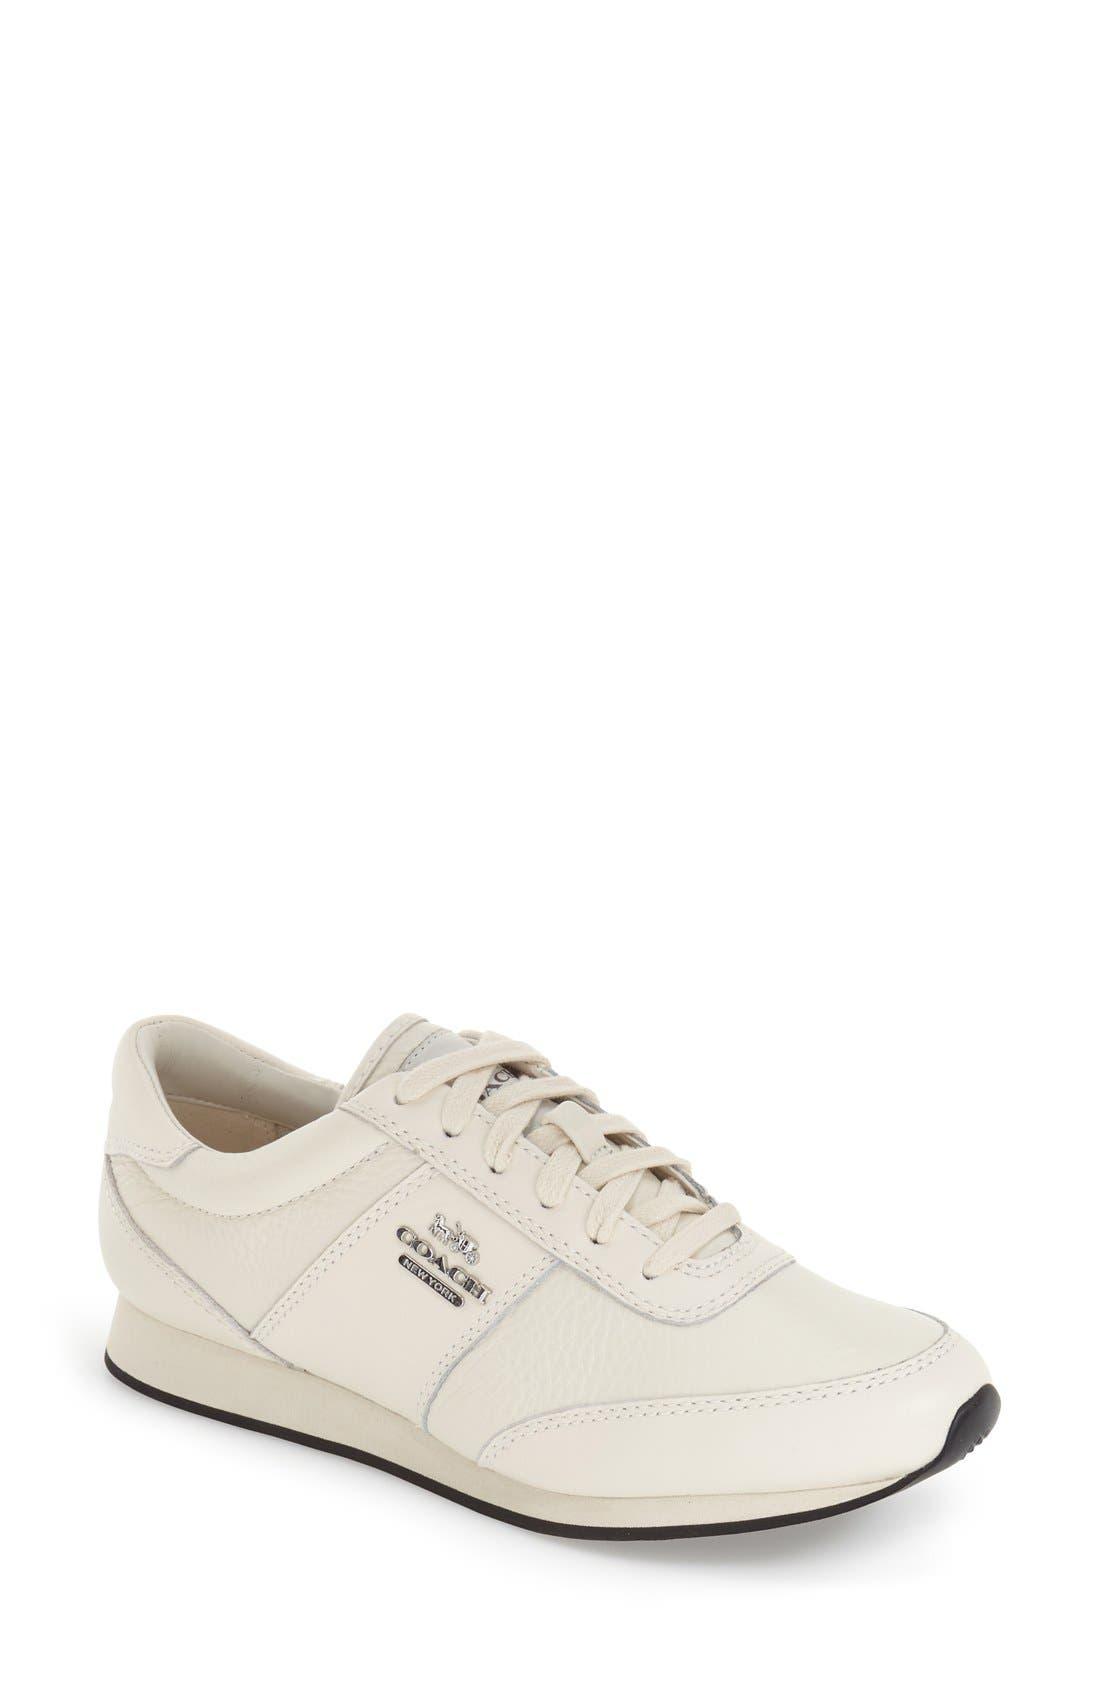 COACH 'Raylen' Leather Sneaker